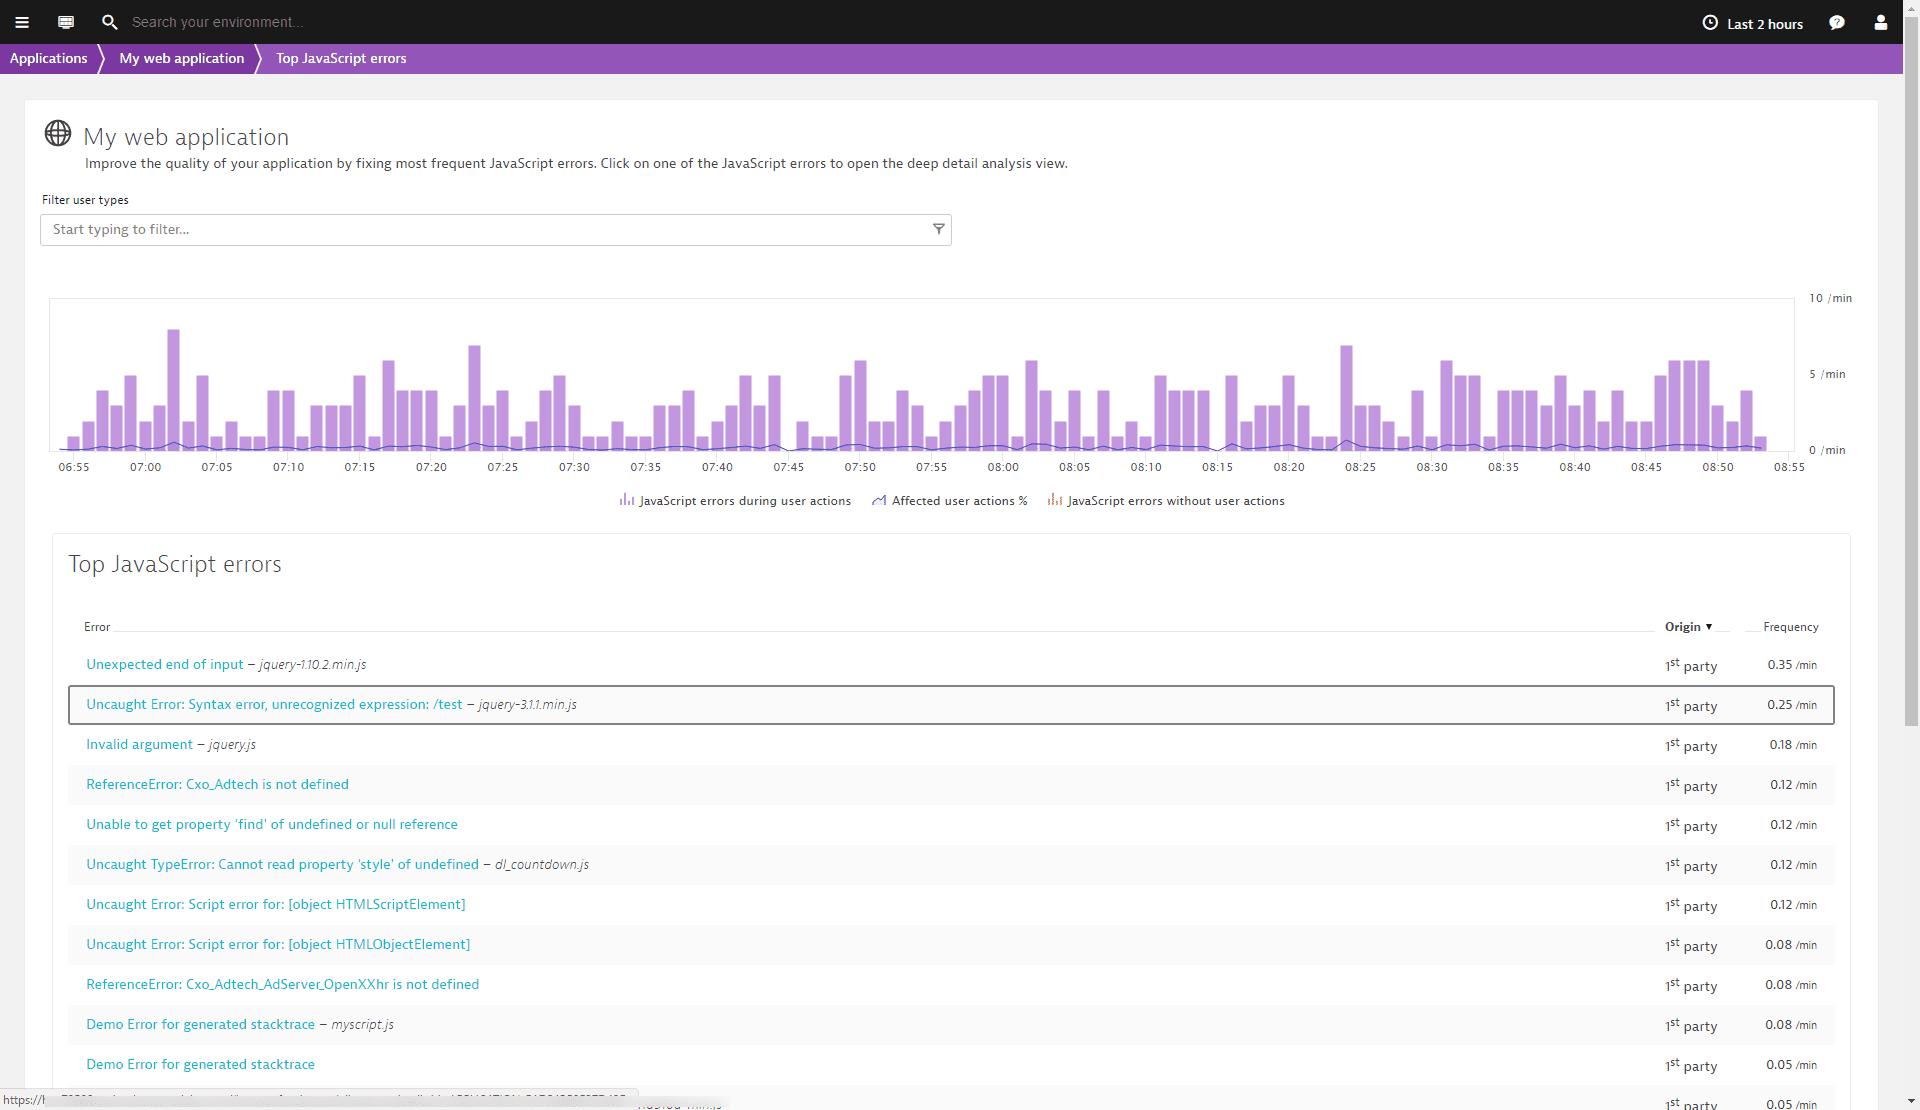 top javascript errors